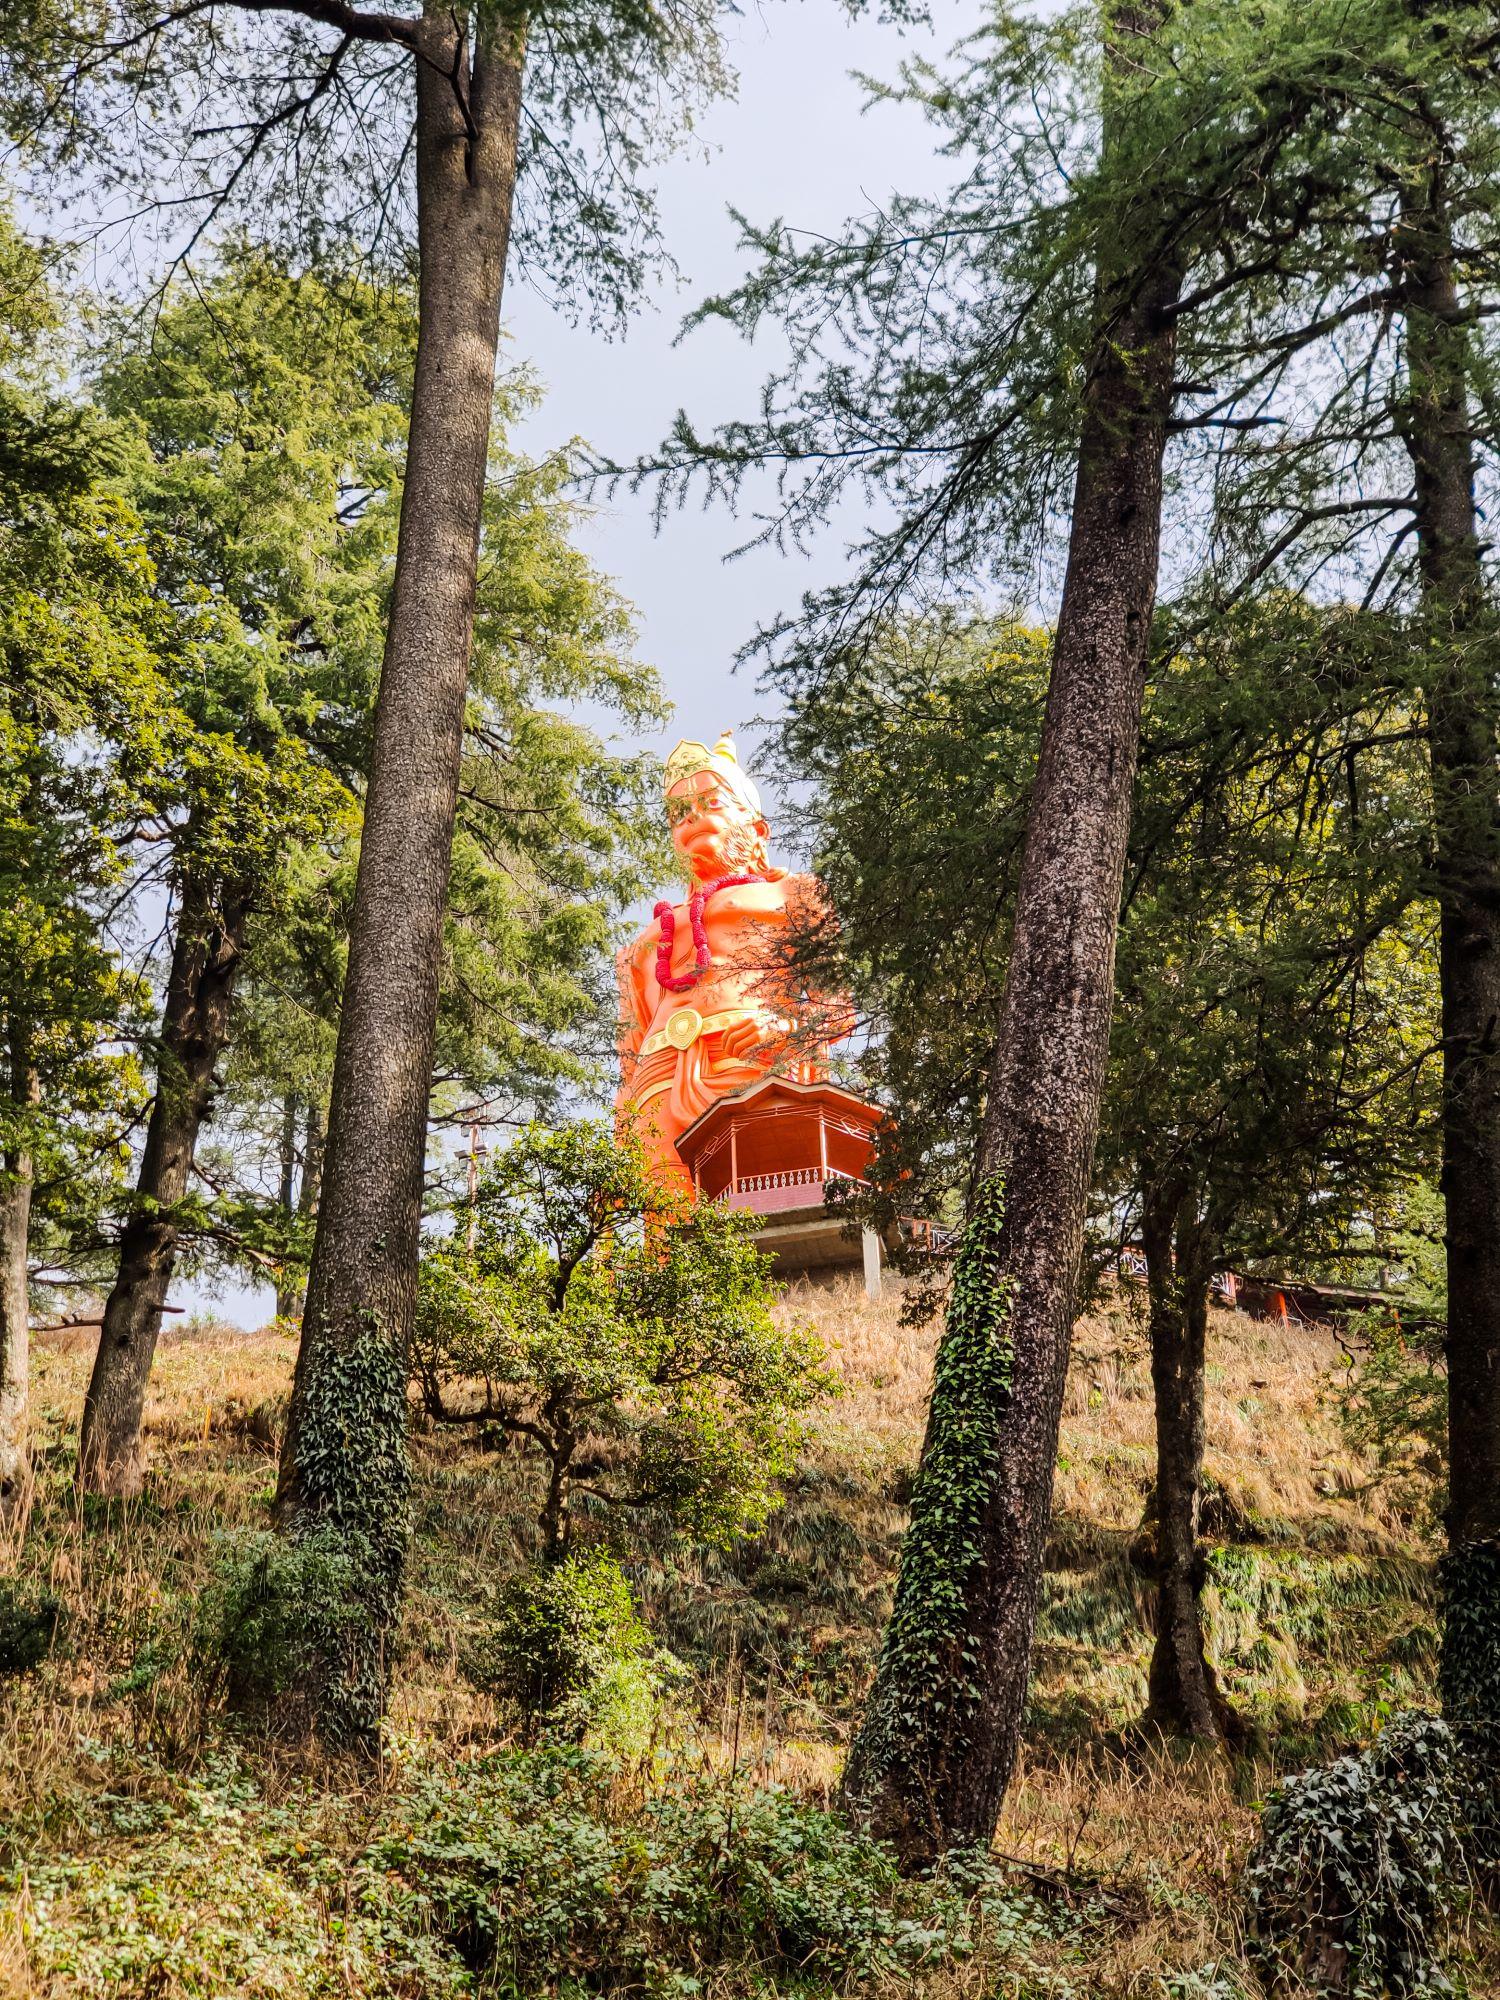 Tallest statue of Hanumanji on the periphery of Jakhu village and pride of Shimla